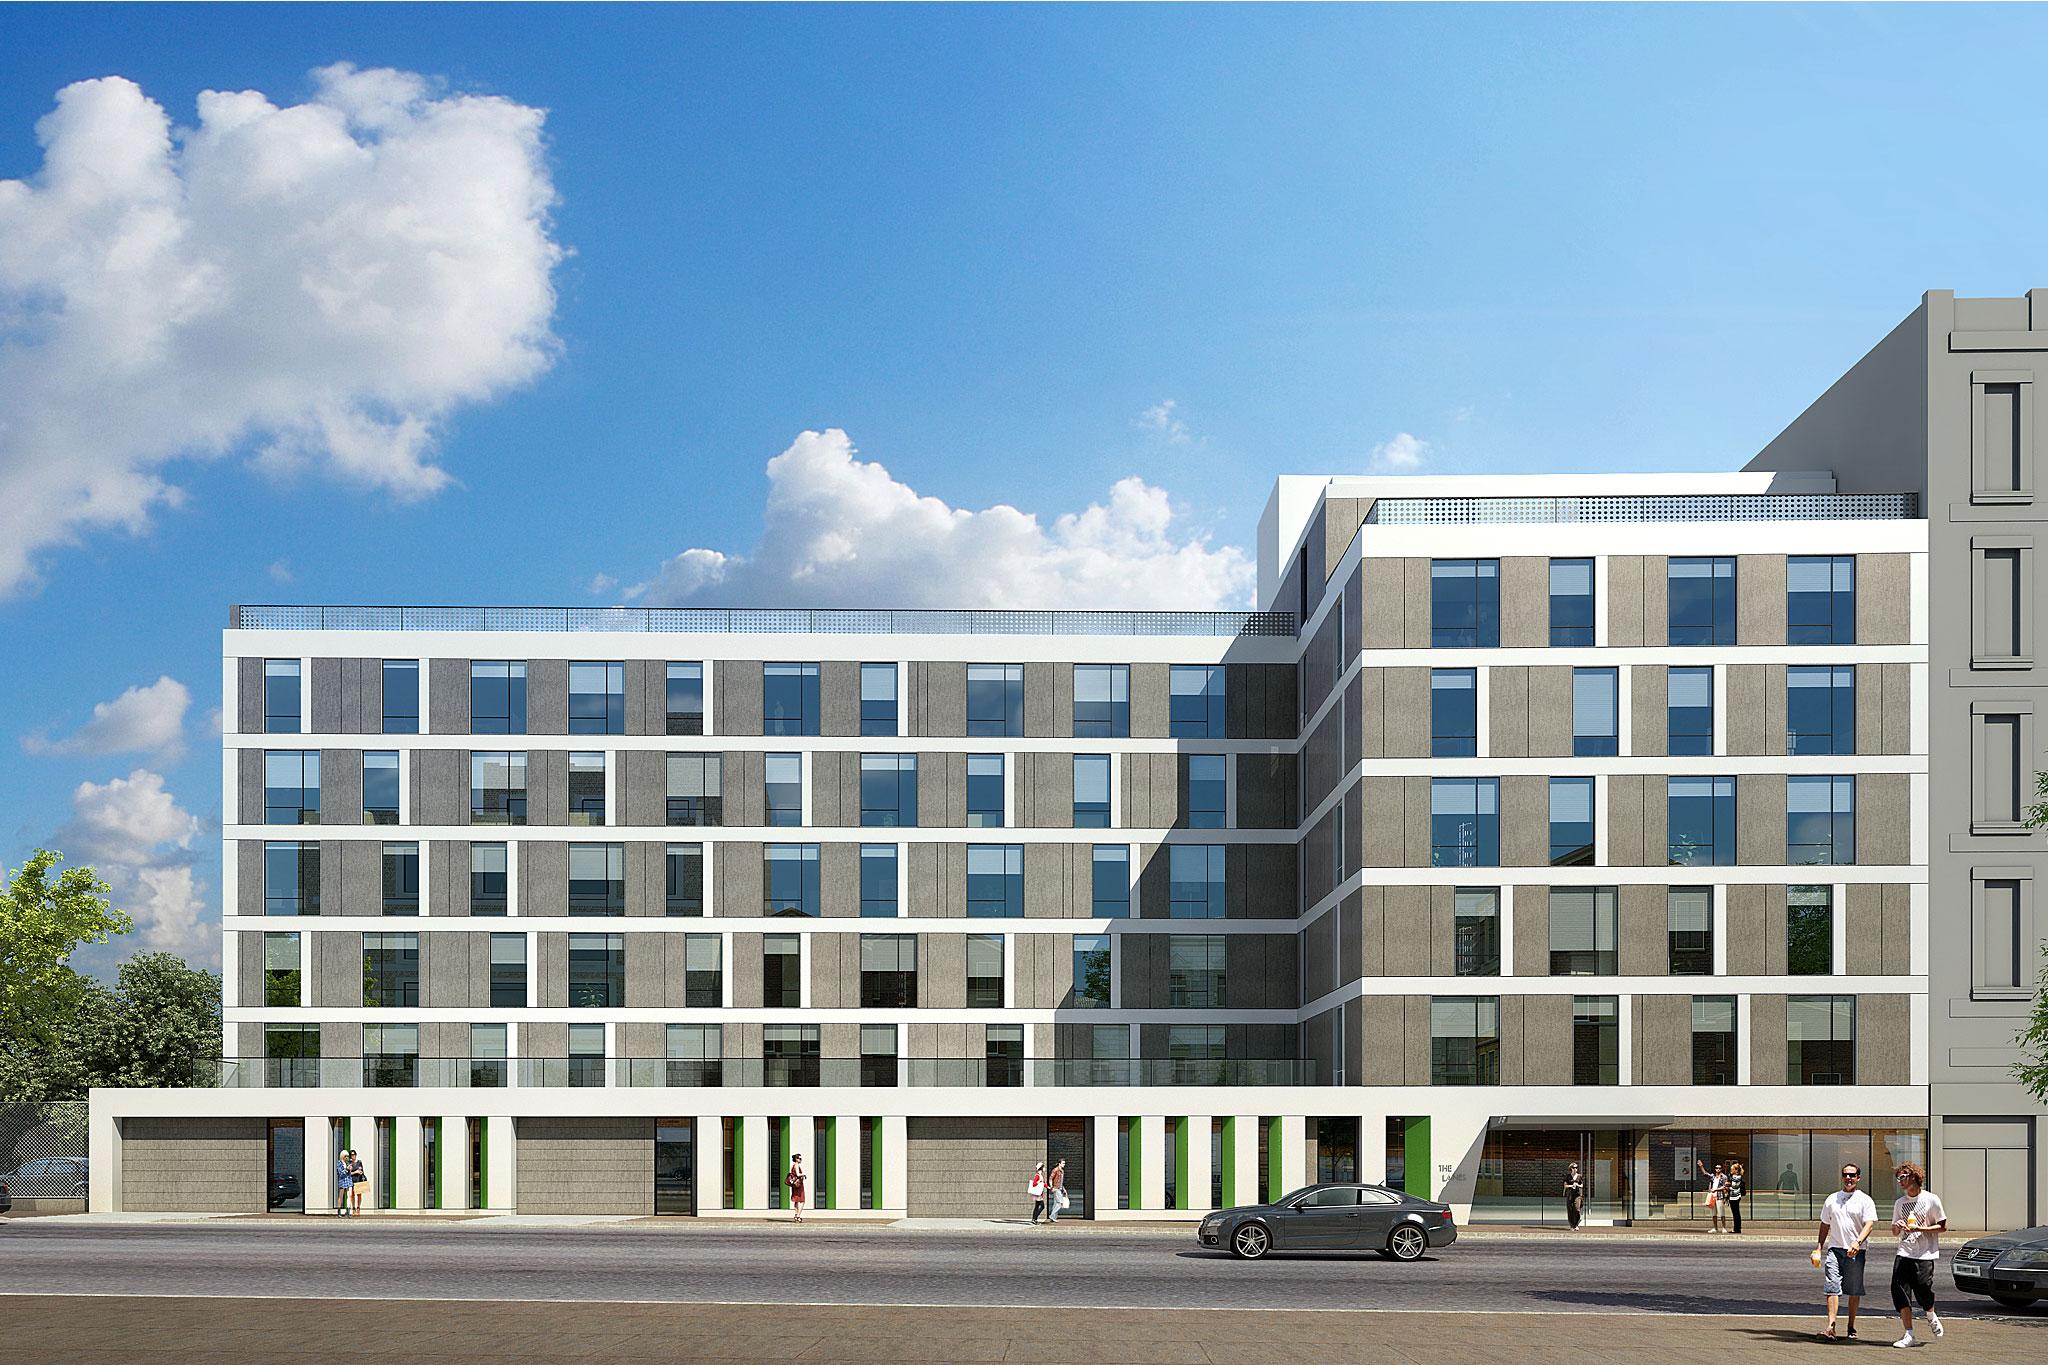 37-10 Crescent Street, Long Island City development, Fogarty Finger, NYC micro housing, Ranger Properties